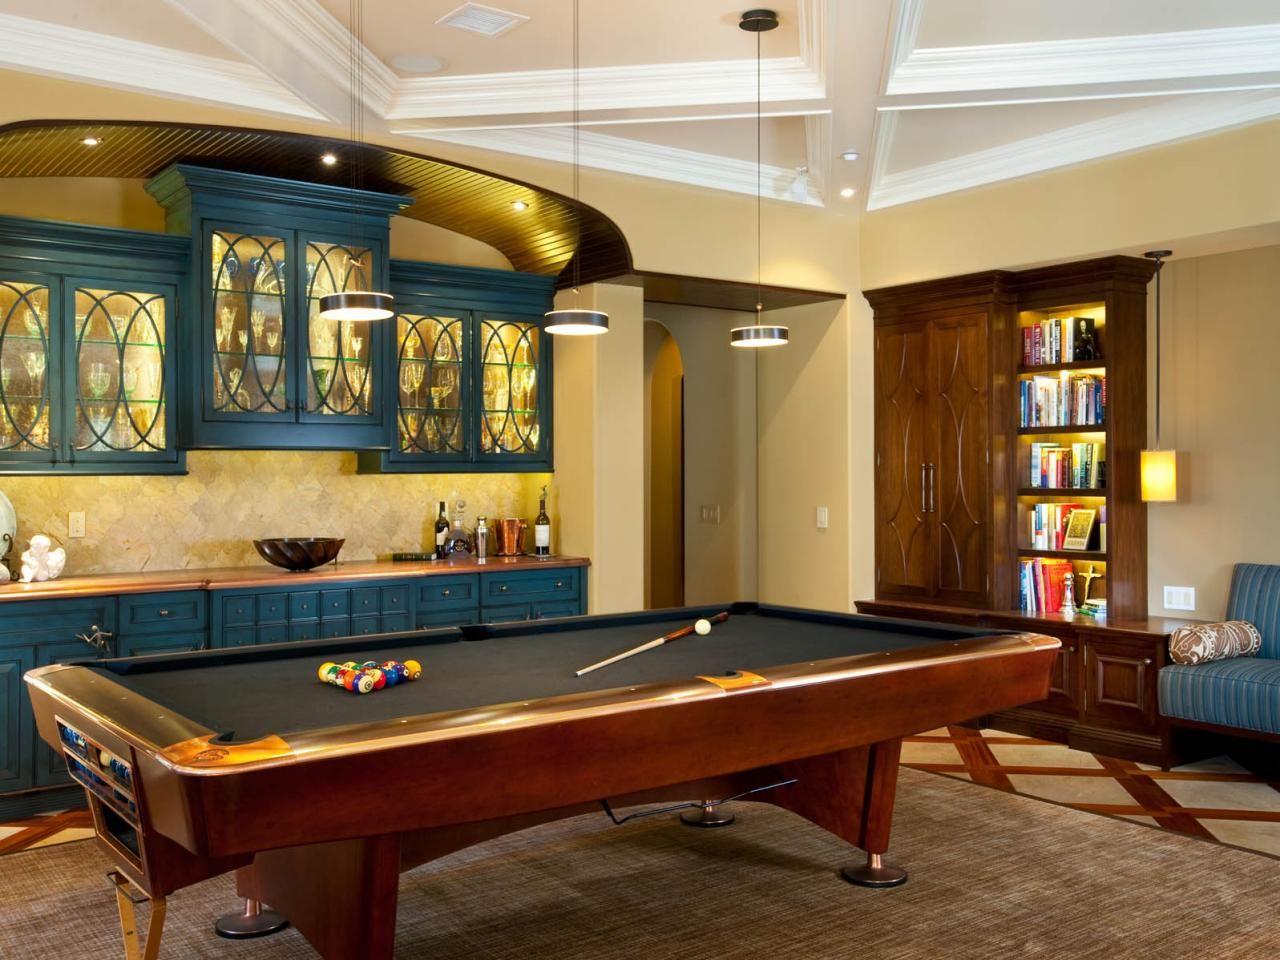 Game Room Design  Game Room Ideas Gallery  Game Room Design Fascinating Pool Table Living Room Design Inspiration Design